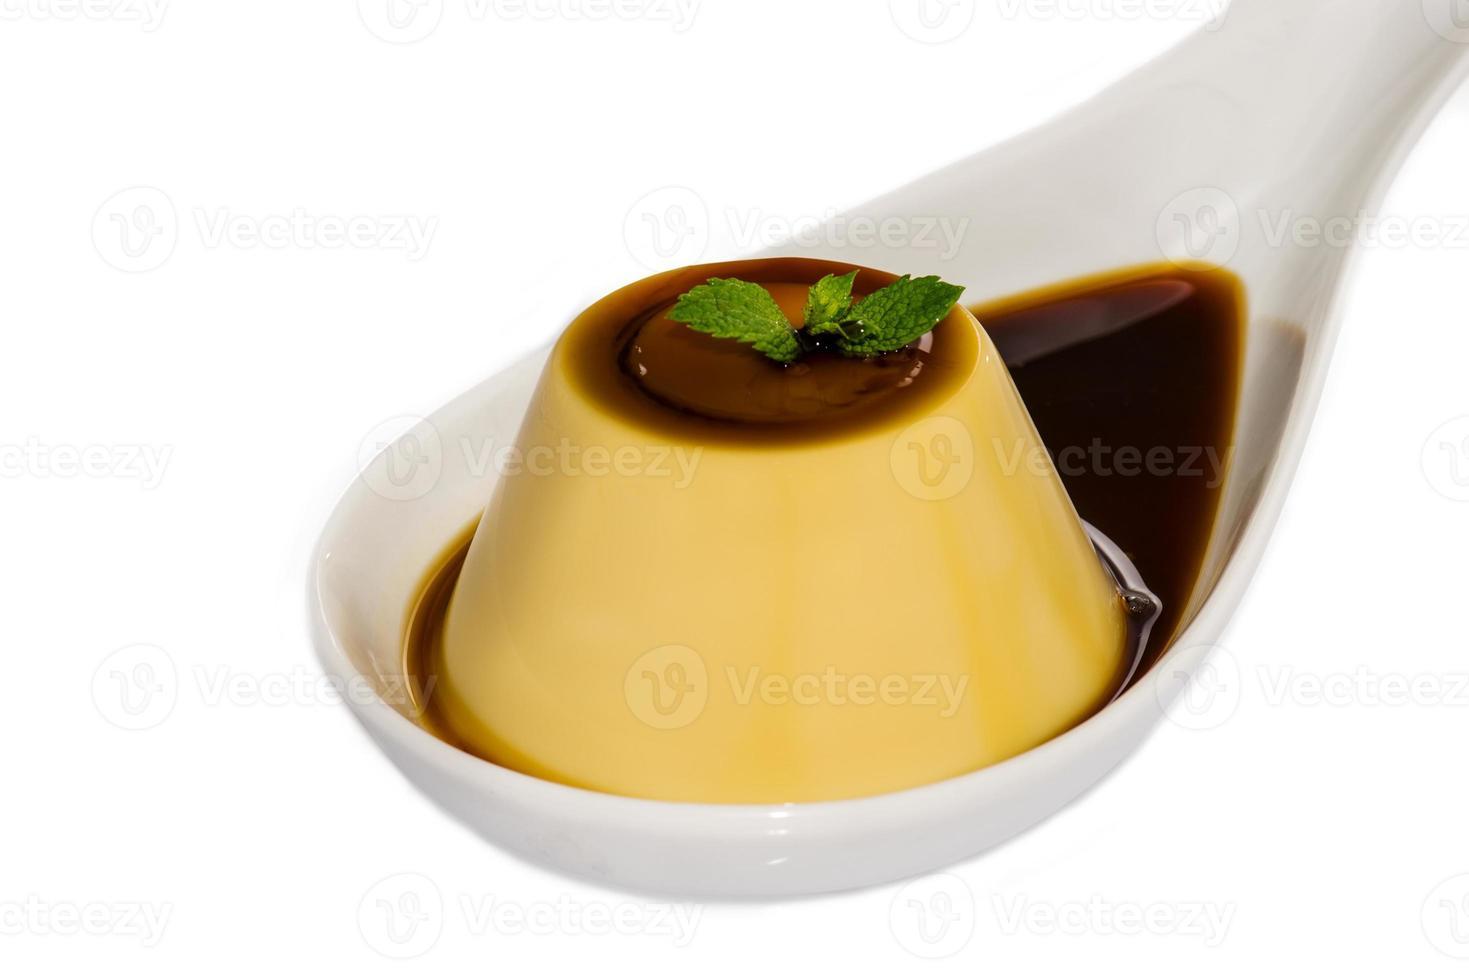 creme karamell, karamell vaniljsås, vaniljsåspudding foto